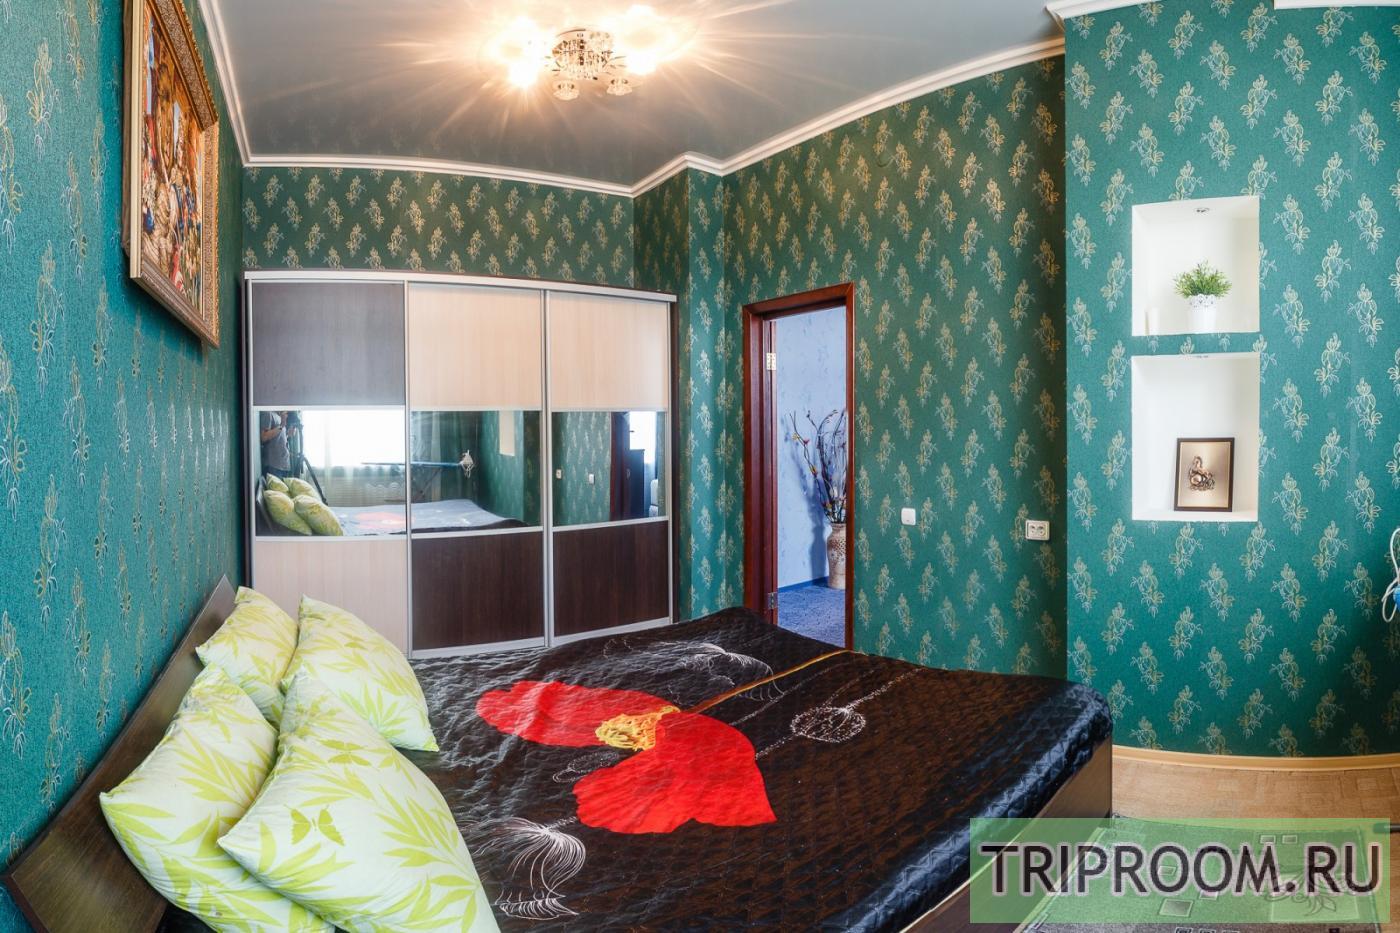 3-комнатная квартира посуточно (вариант № 15948), ул. Назарбаева улица, фото № 6